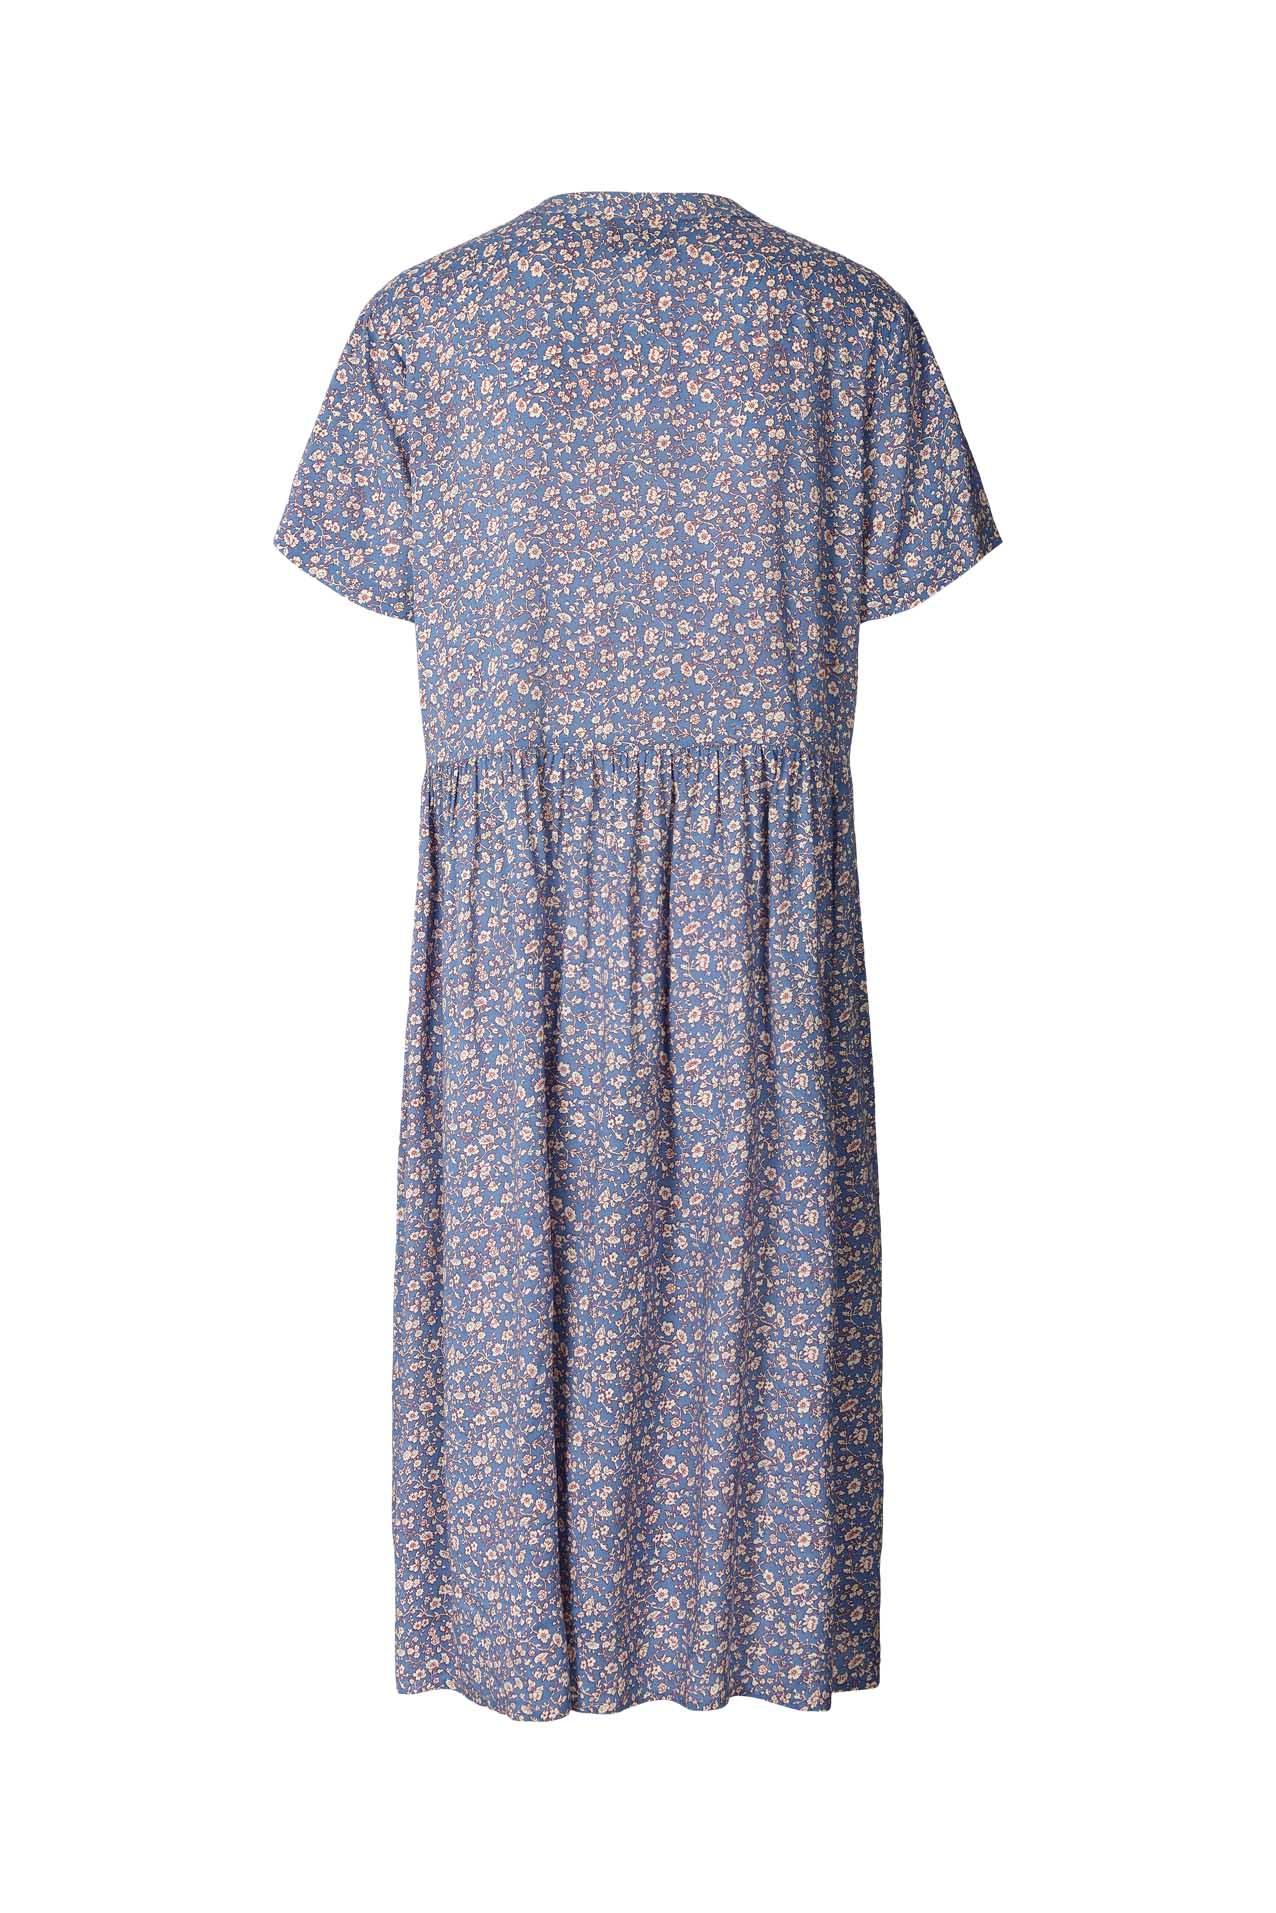 Lollys Laundry Aliya kjole, blue, large